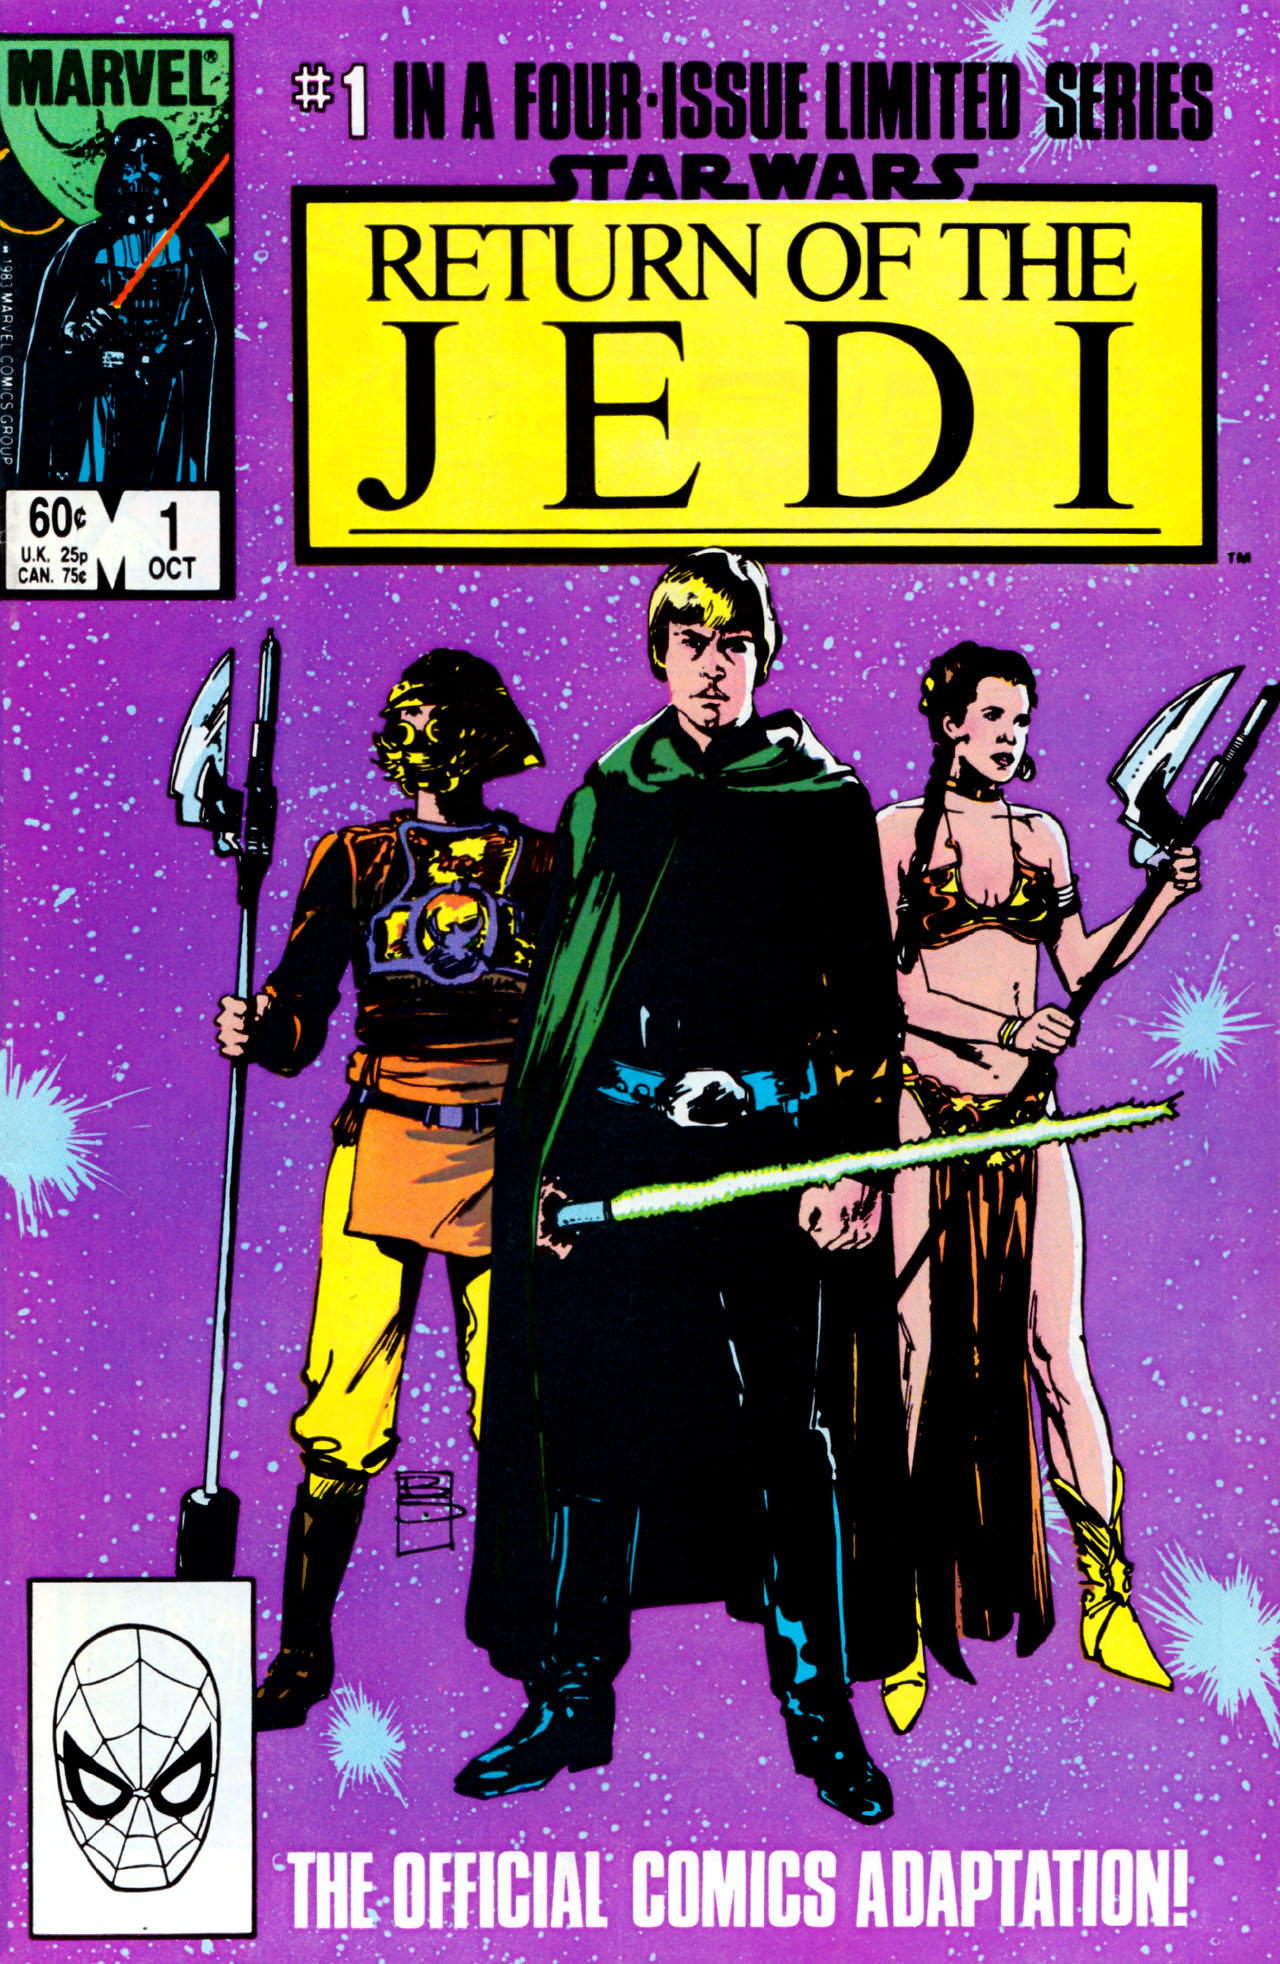 Star Wars: Return of the Jedi 1 Page 1